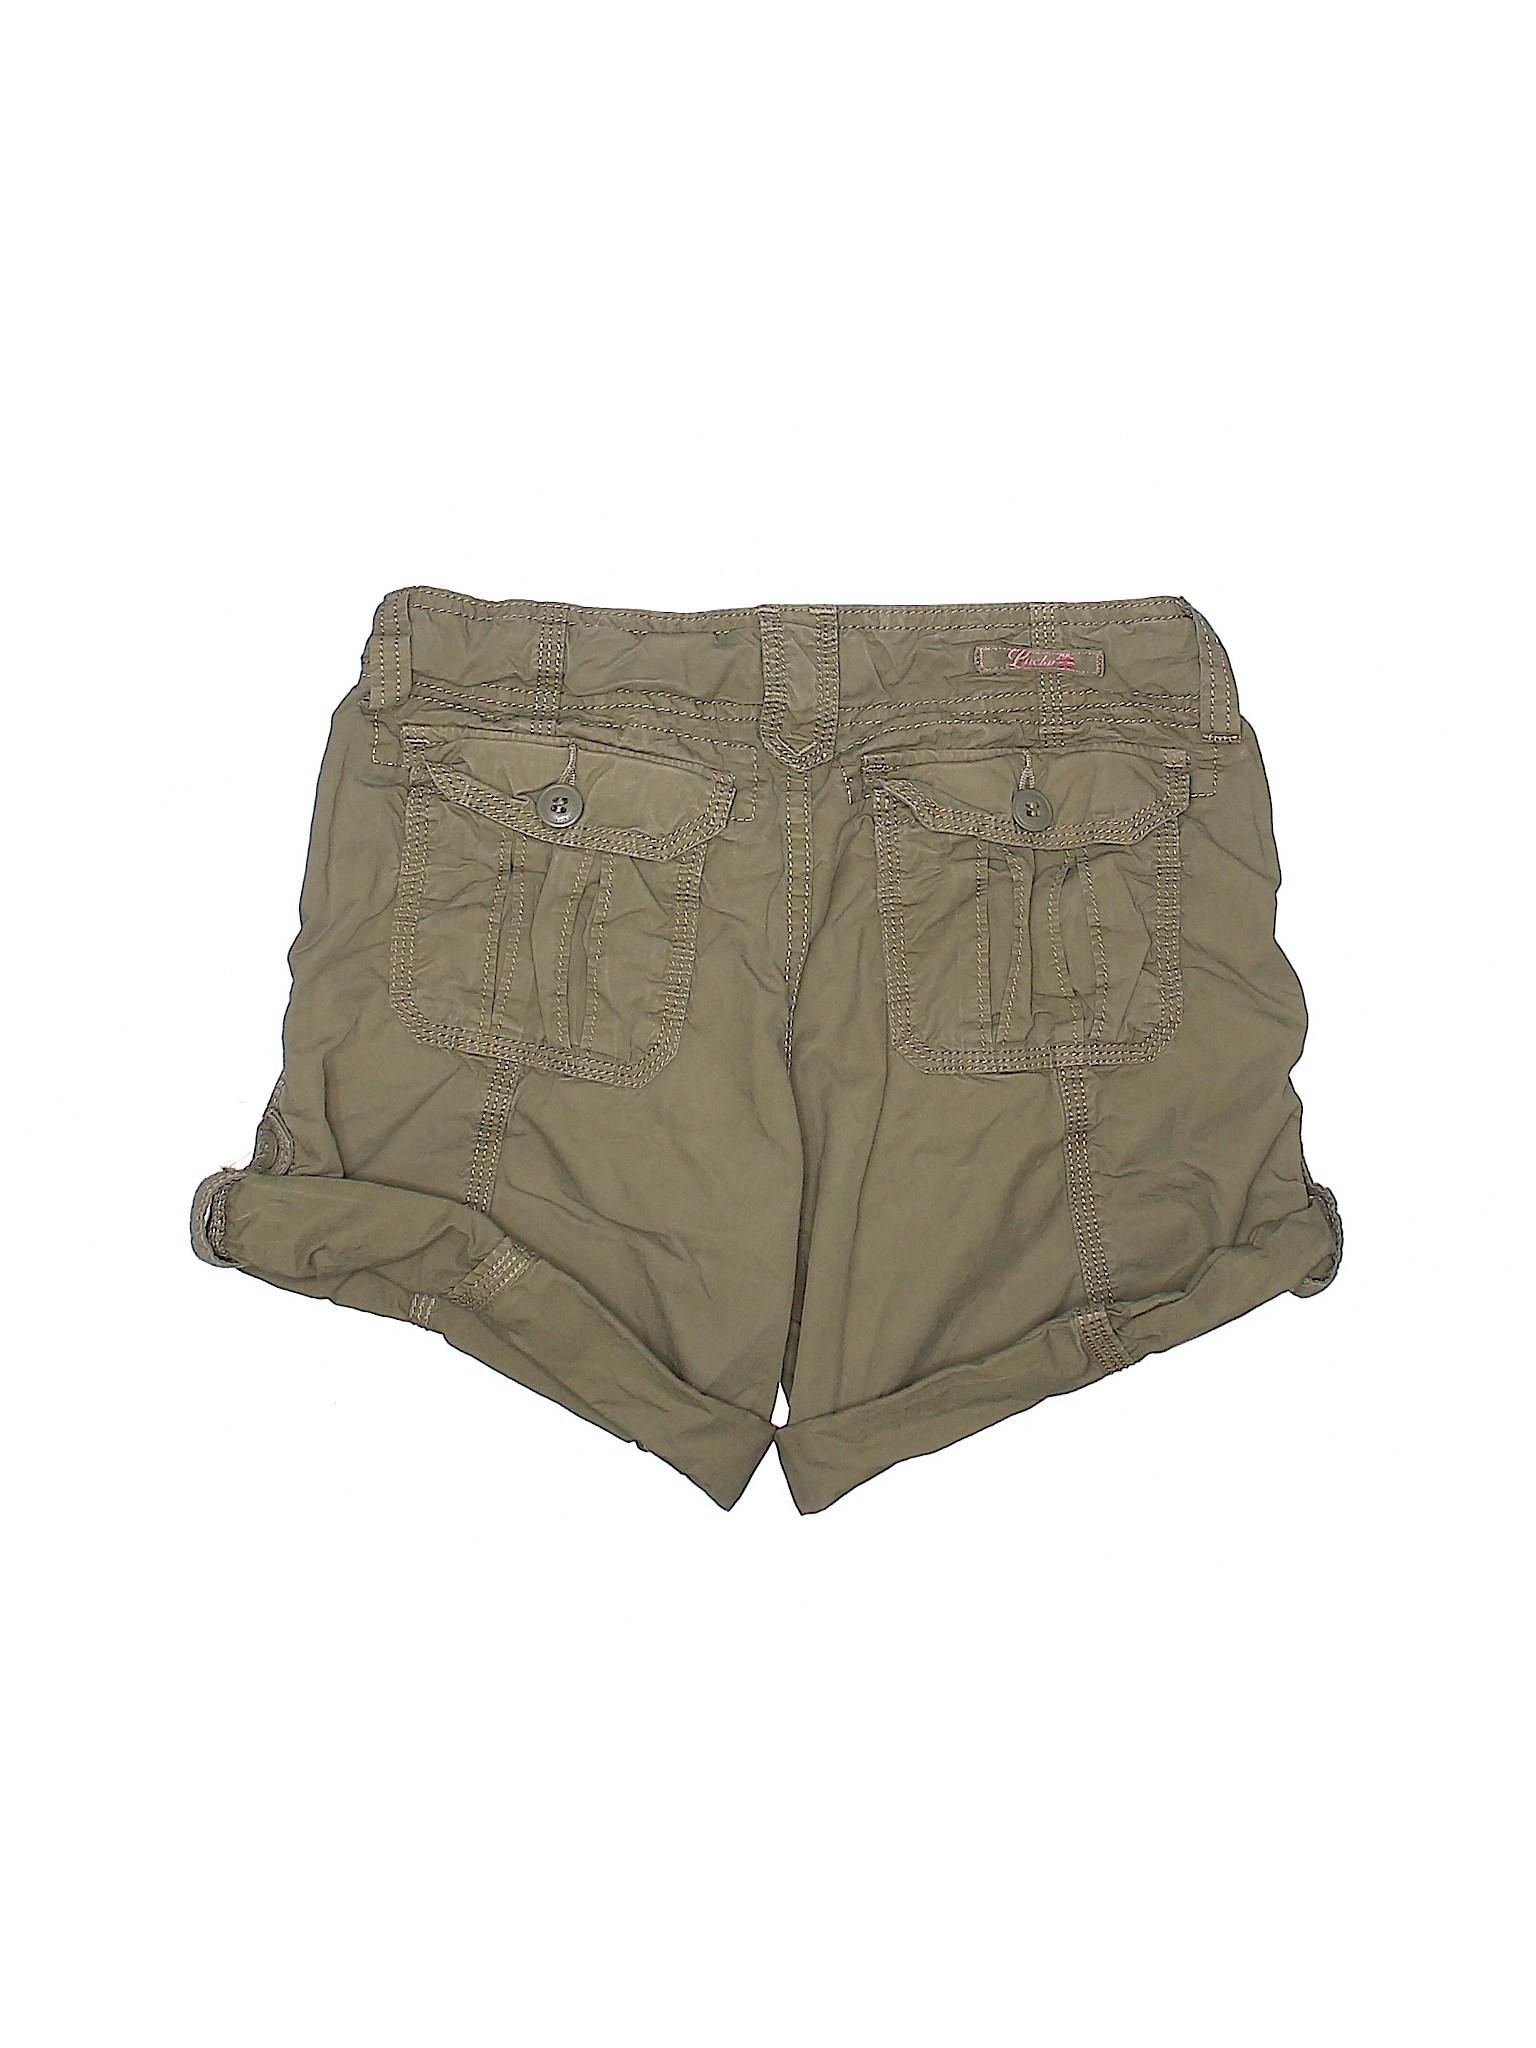 Boutique Khaki Khaki Boutique Lucky Lucky Shorts Lucky Shorts Boutique FqCSwarF